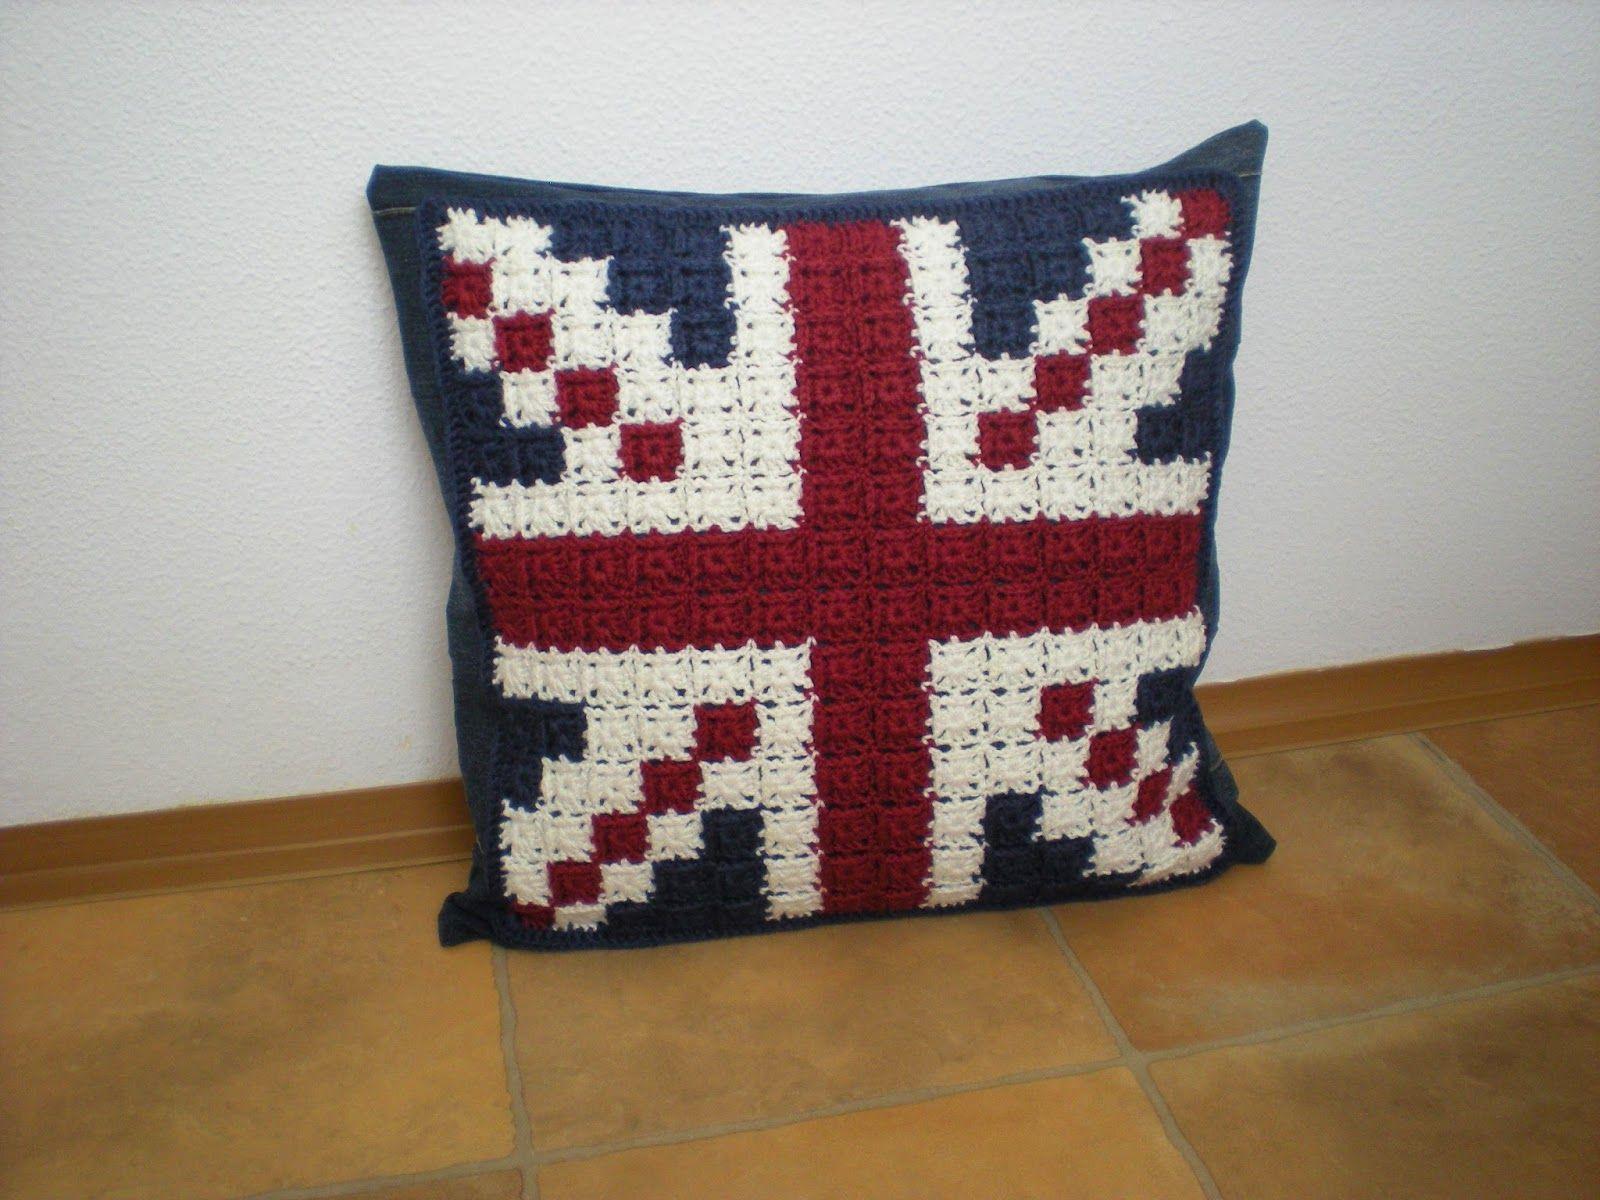 EmmHouse: Feeling Patriotic - Union Jack Pillow / Cushion Cover ...